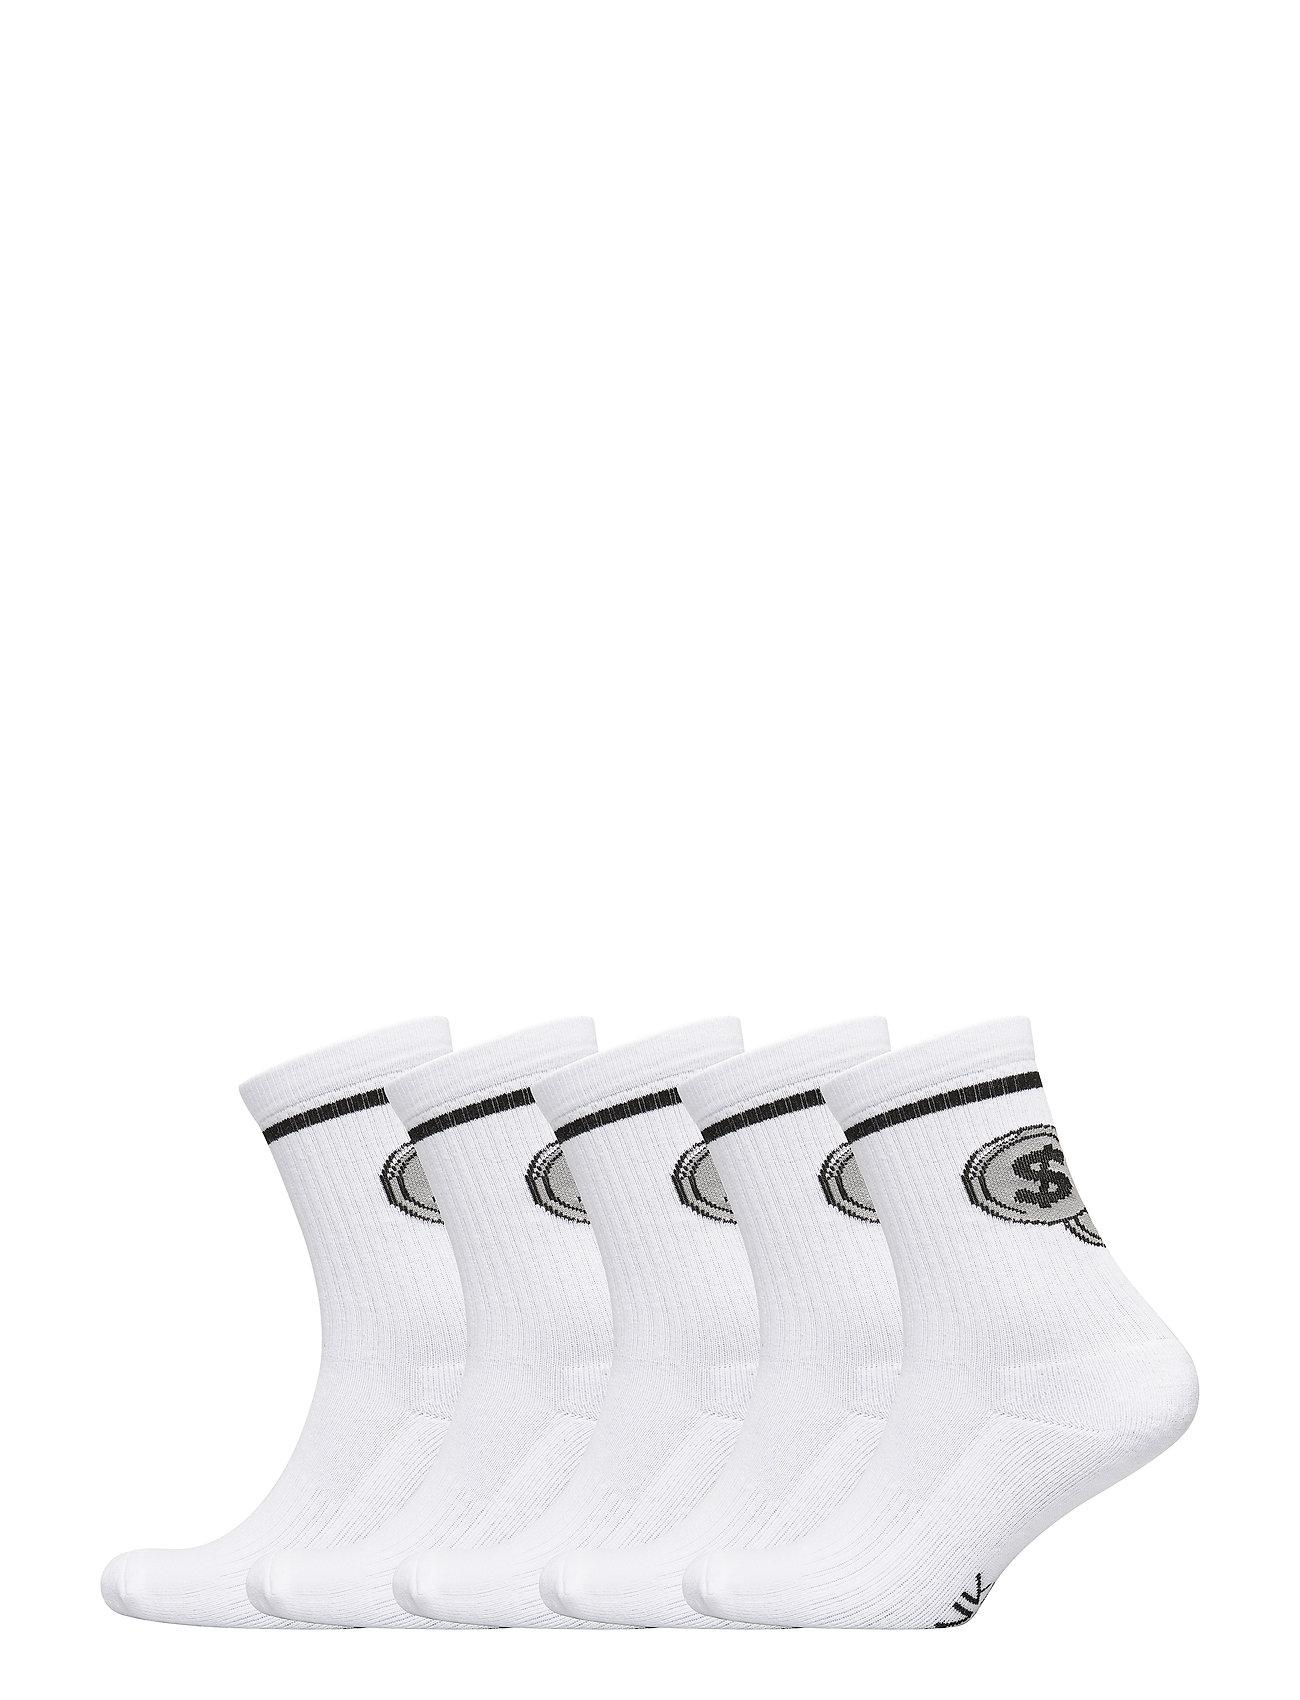 Frank Dandy Half Terry Sock 800 Mill - WHITE